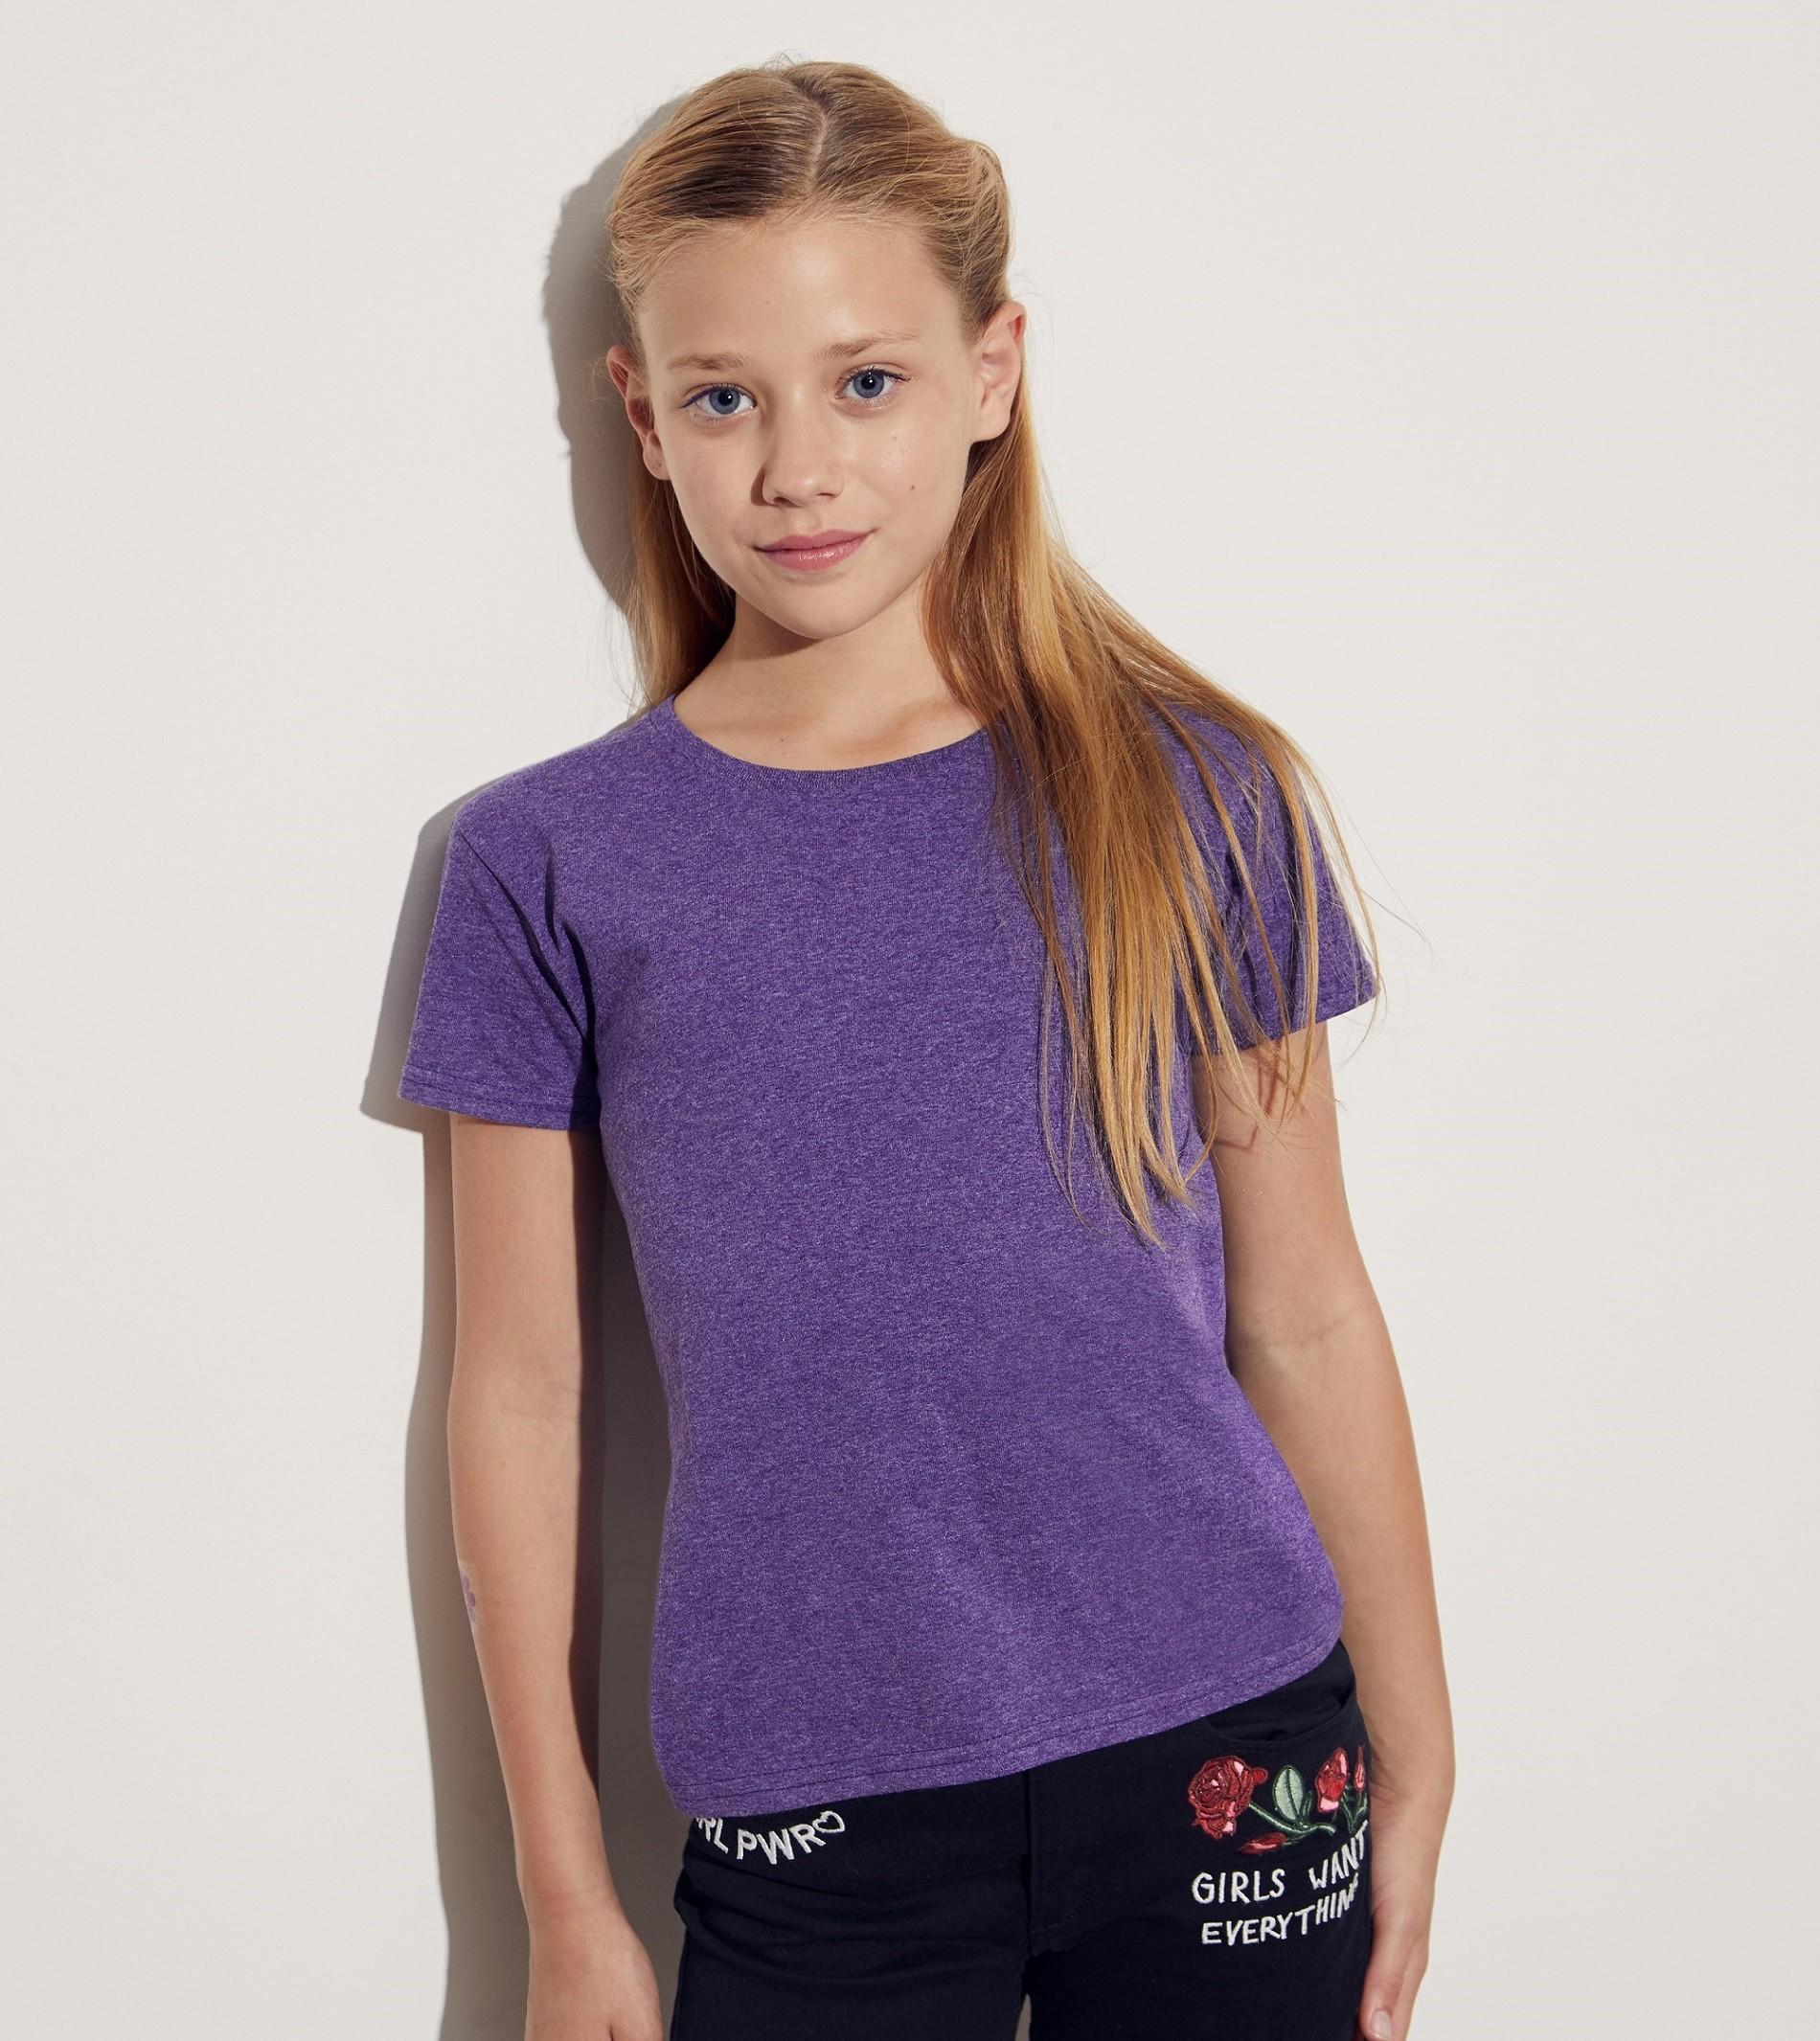 cee786fe7 T Shirt Printing - Design & Personalise Custom T Shirts | Banana Moon